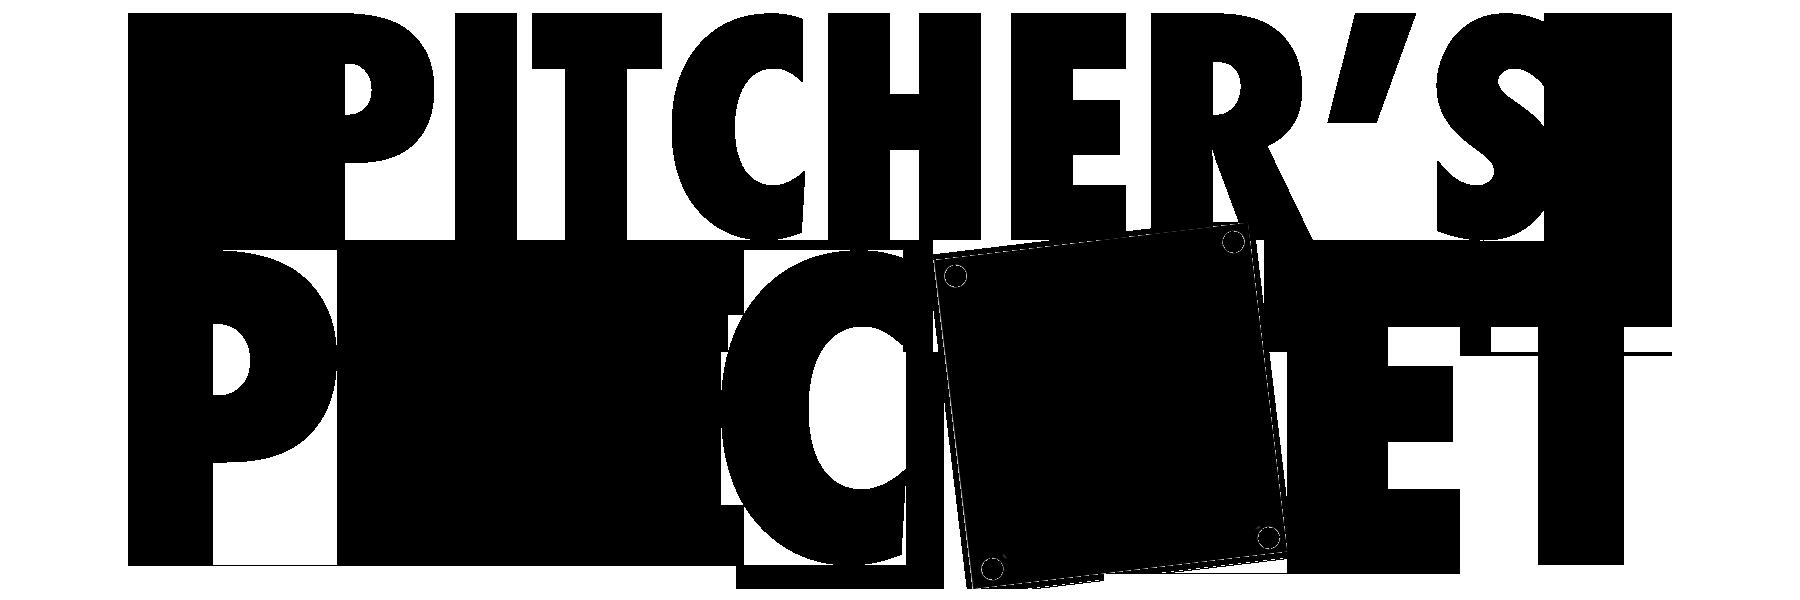 Baseball backstop clipart vector free stock The Pitcher's Pocket – No catcher? No Problem!   NuStarz Sports vector free stock